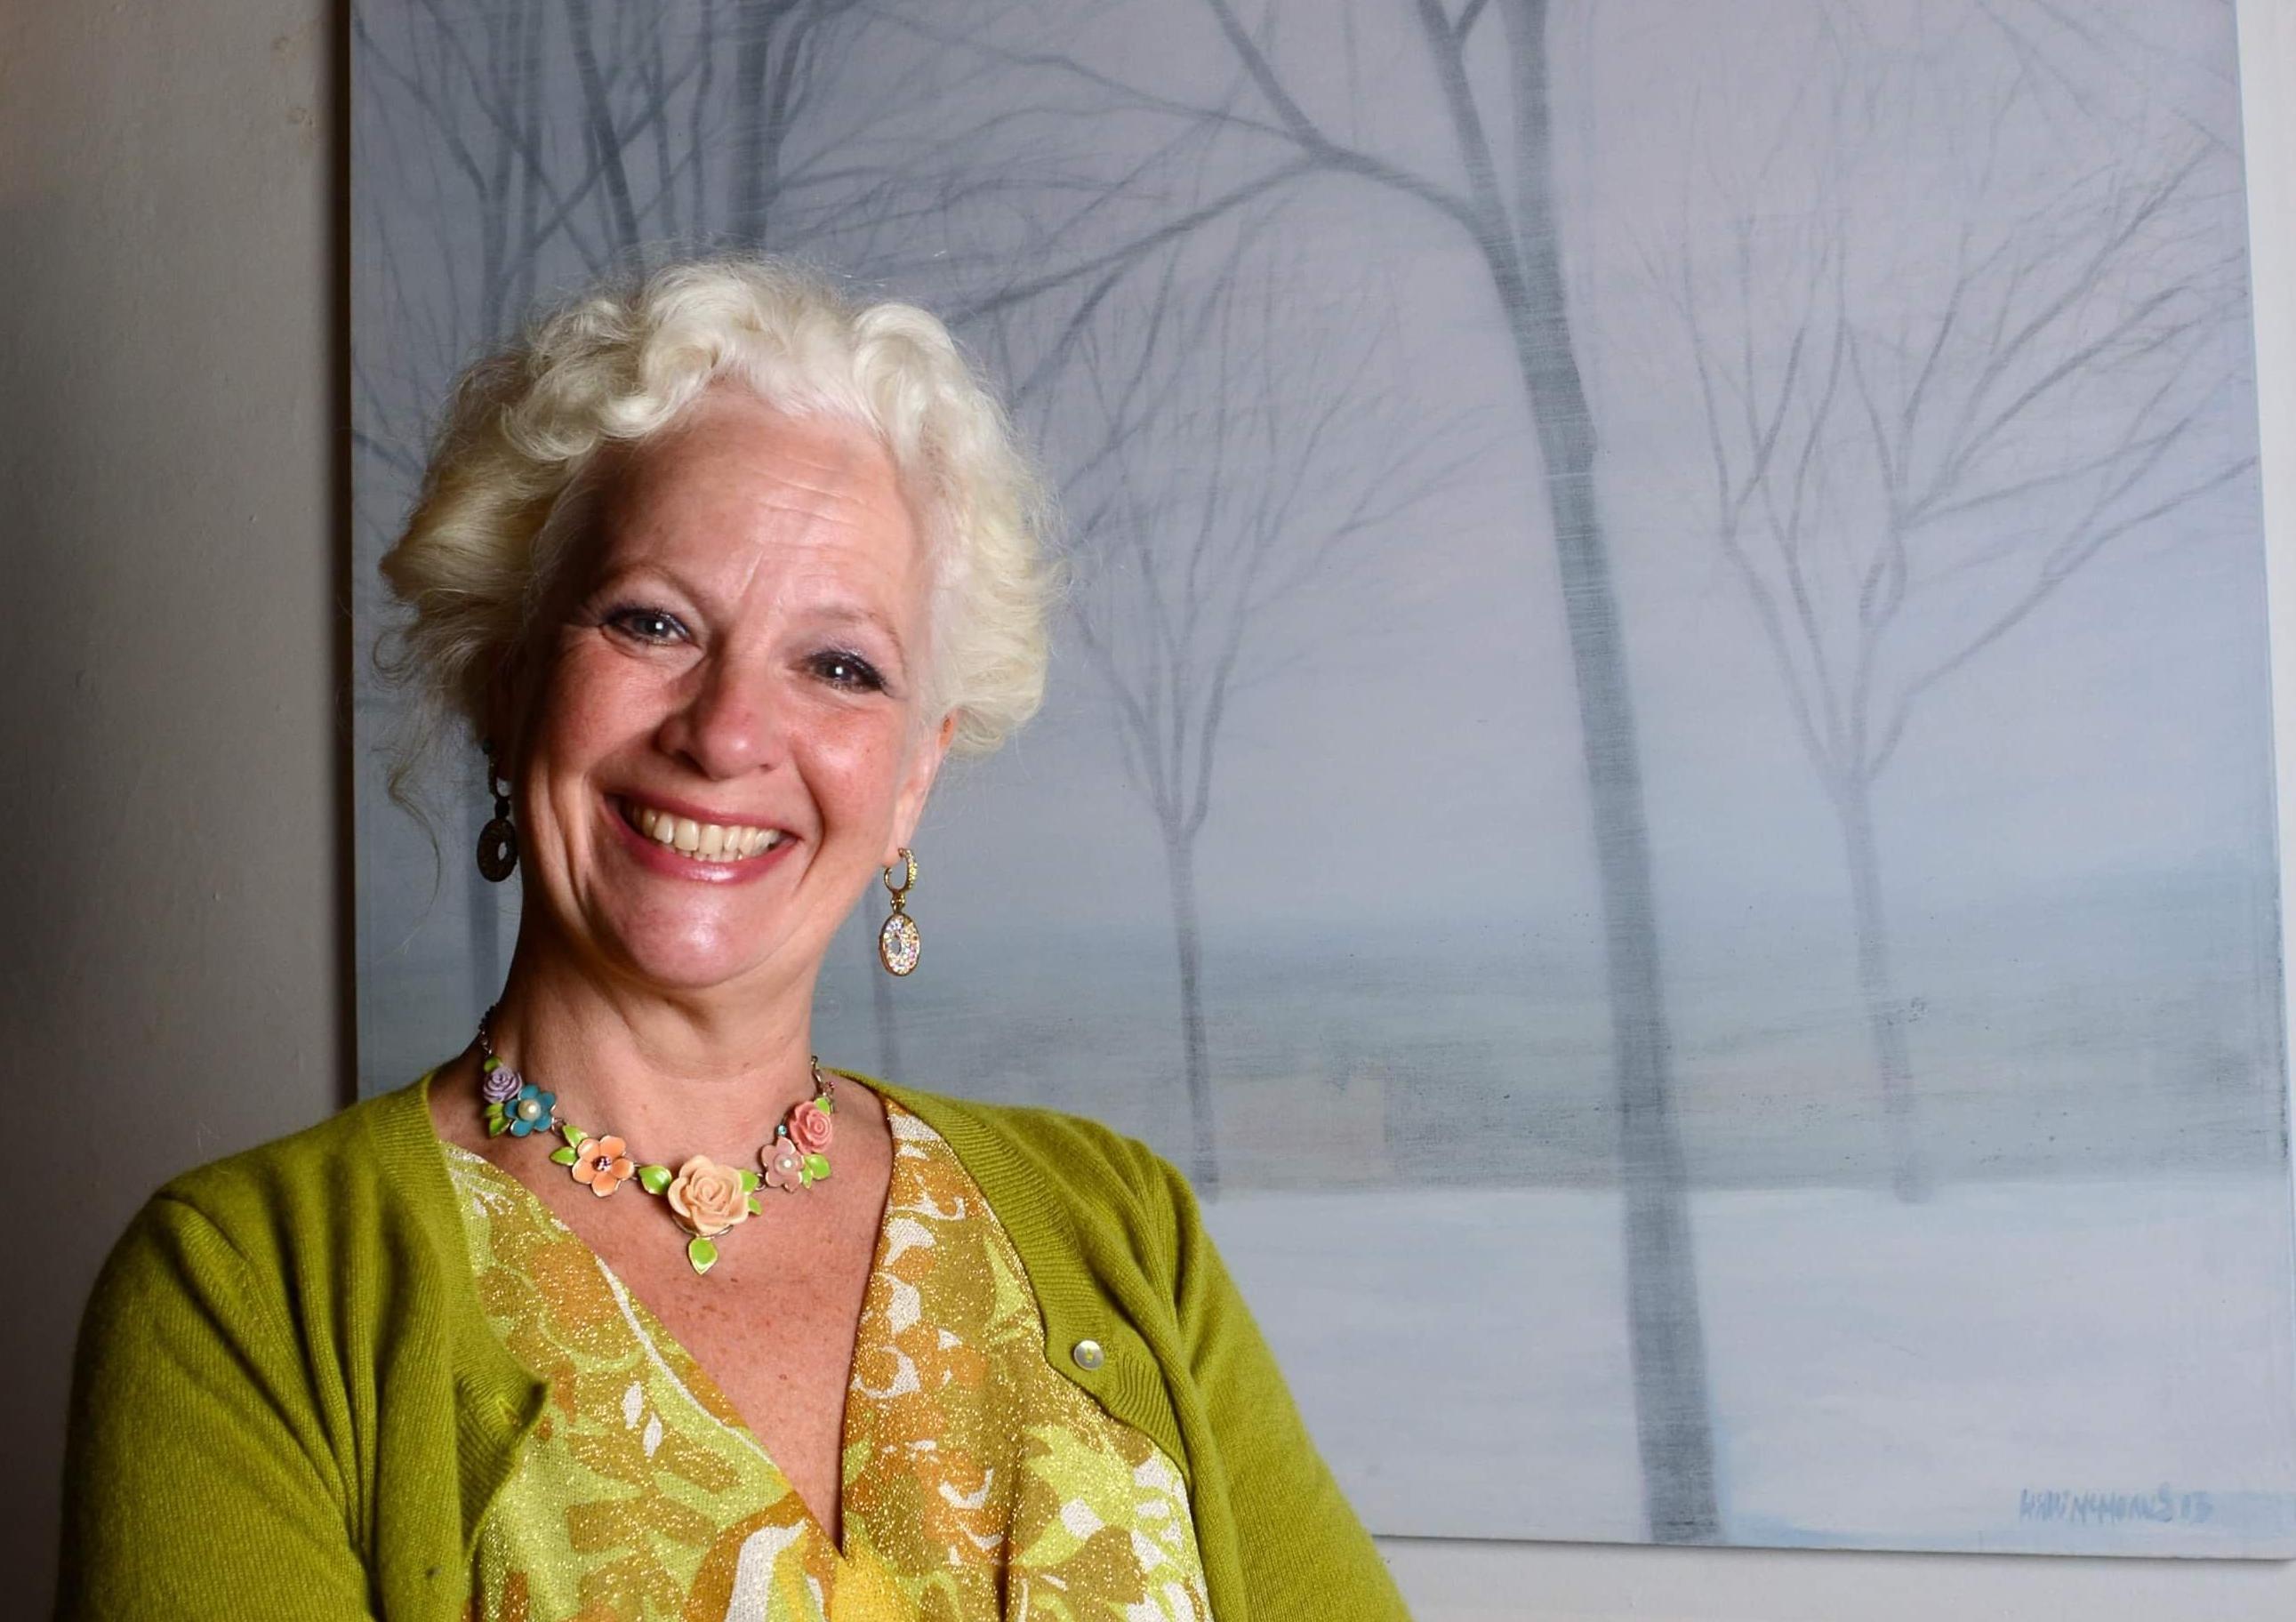 Lancaster Artist Returns With Restaurant Exhibition After